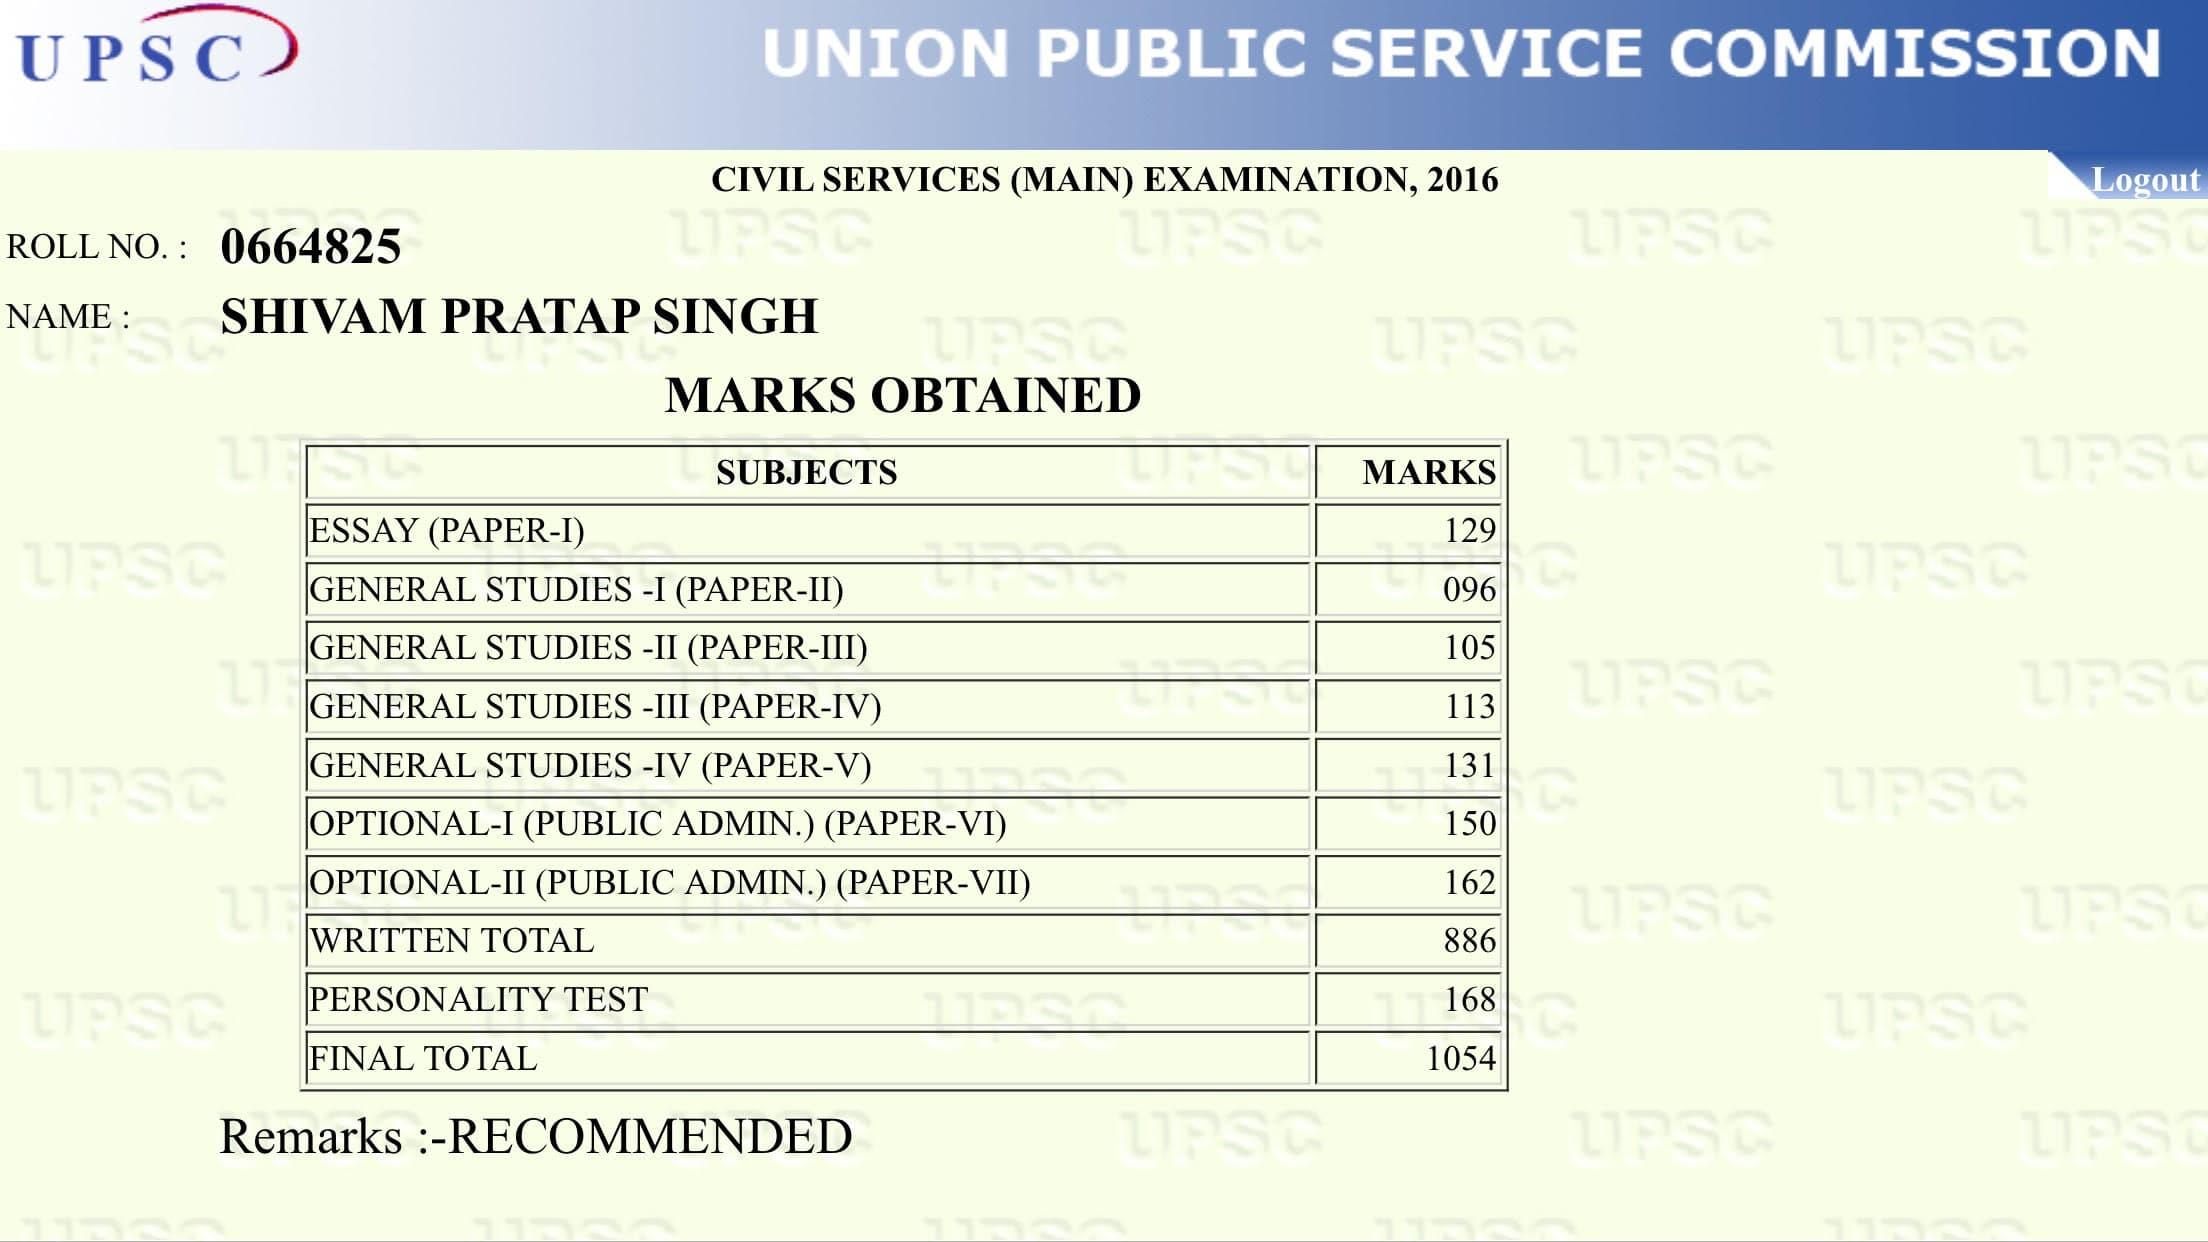 AIR 52 UPSC CSE 2016 Shivam Pratap Singh, IAS/UPSC TOPPERS STRATEGY-PUBLIC ADMINISTRATION